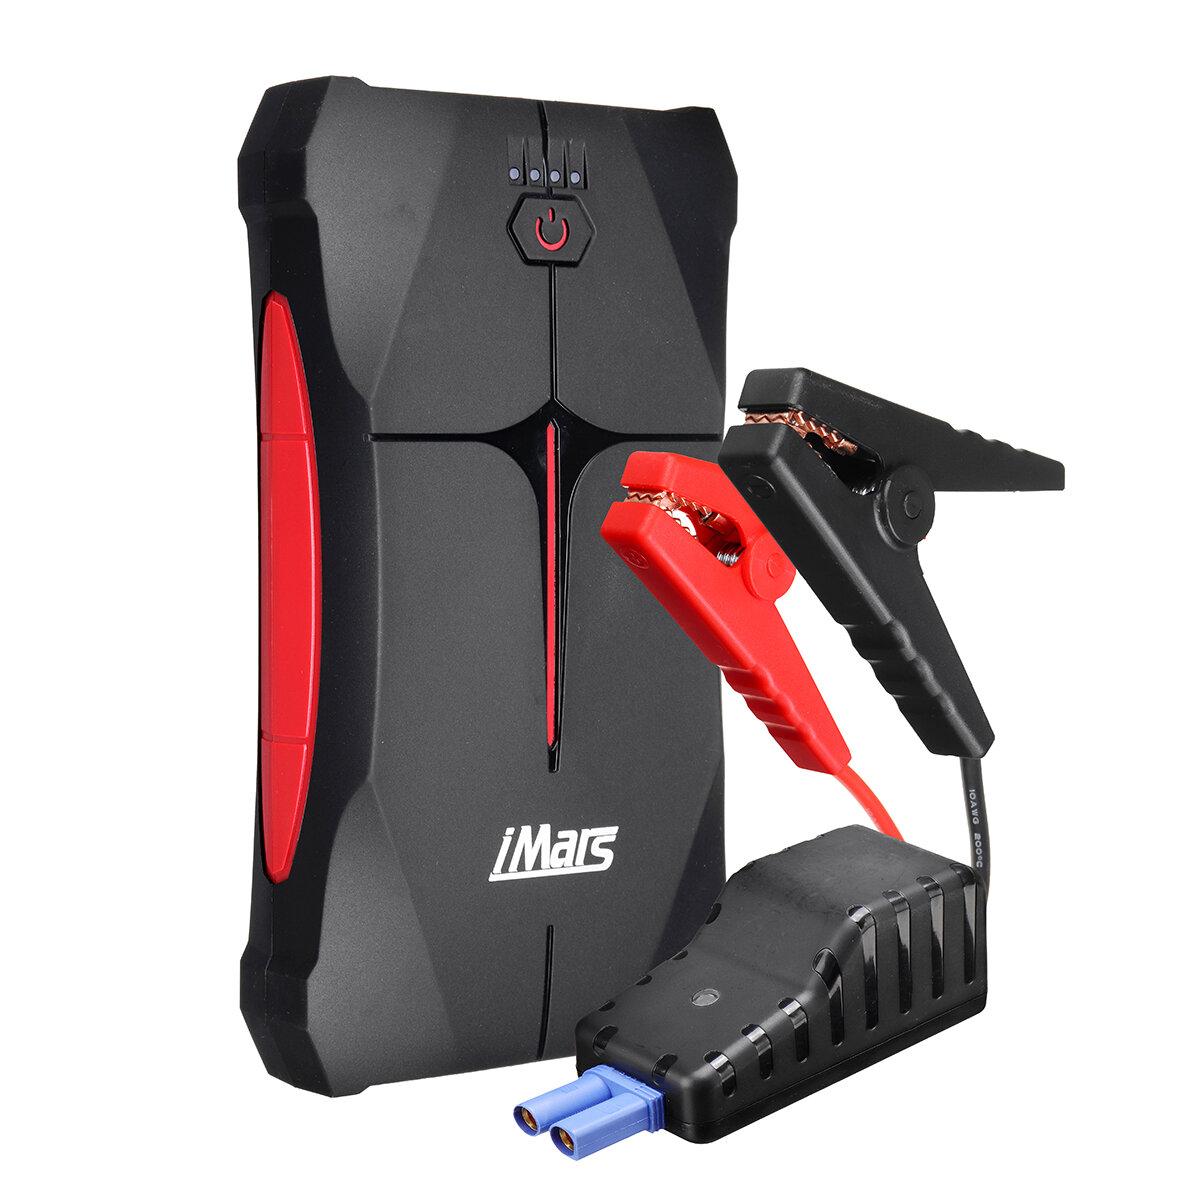 iMars Portable Car Jump Starter 1000A 13800mAh Powerbank Emergency Battery Booster Waterproof with LED Flashlight USB Port